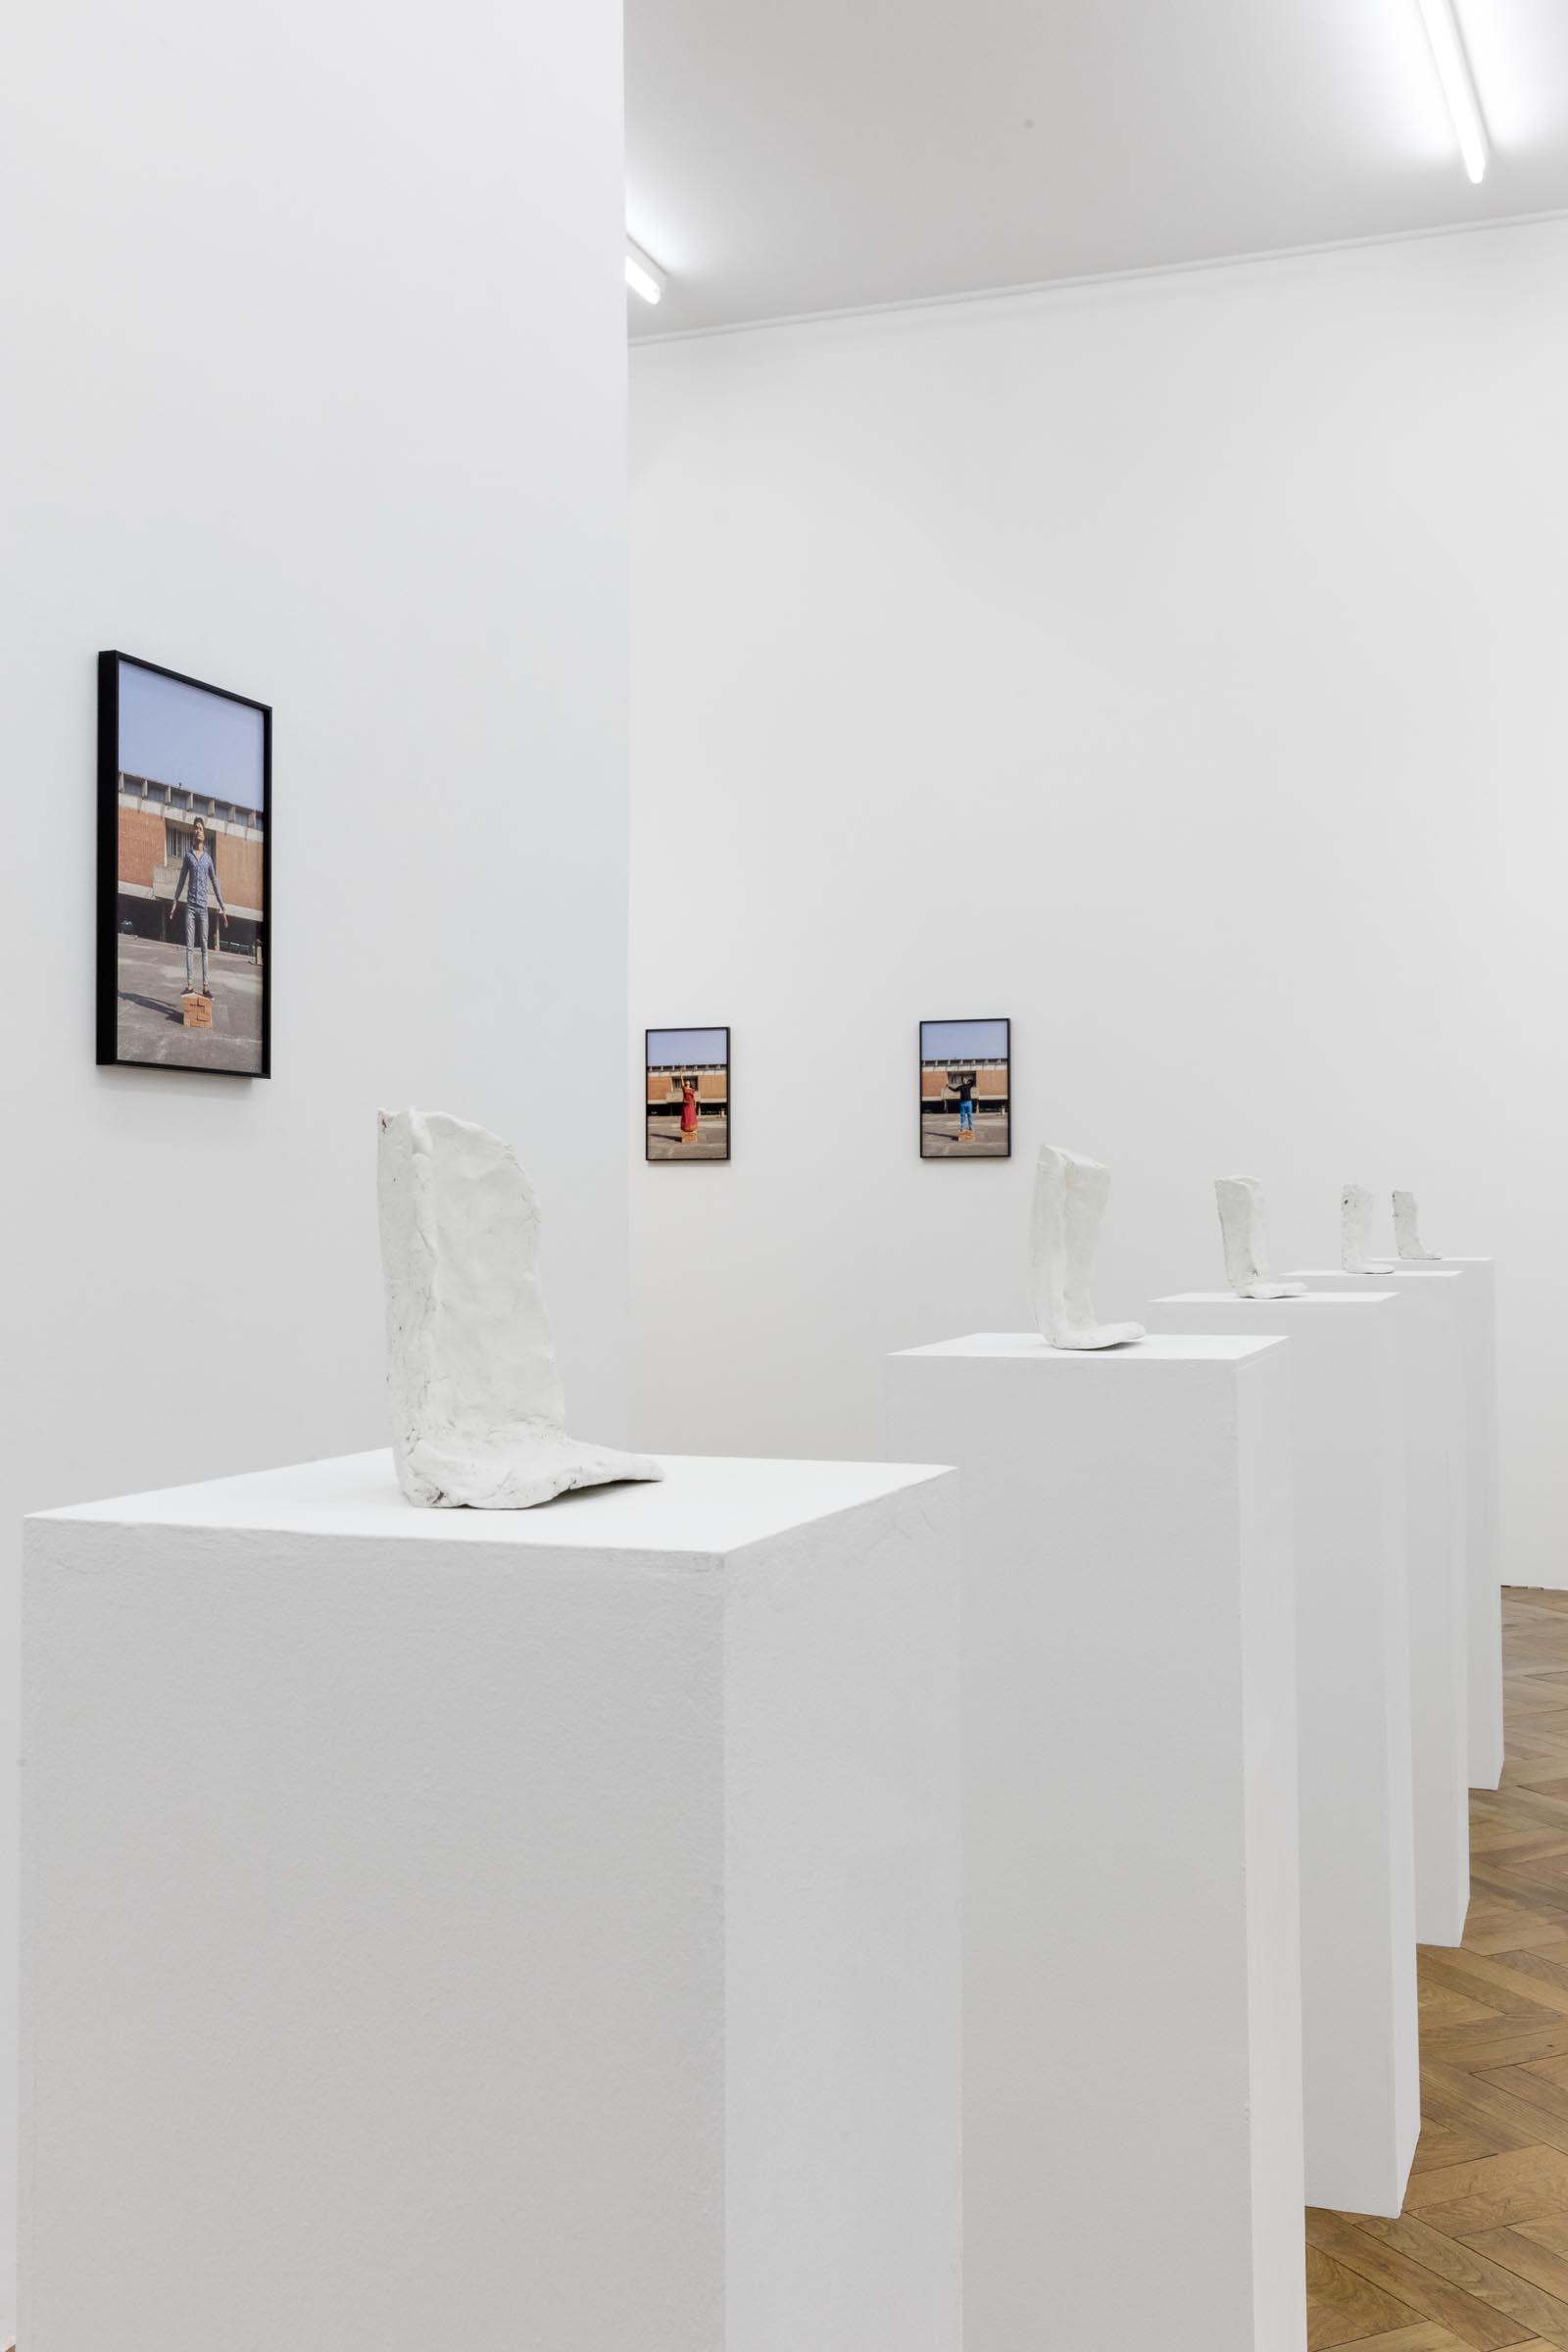 Thomas Geiger, Corners for Relief, 2019, Sculpting Clay, Filth, Plinth, Set of 5, Sculpture: 16 x 12 x 11 cm, Plinth: 105 x 27 x 27 cm